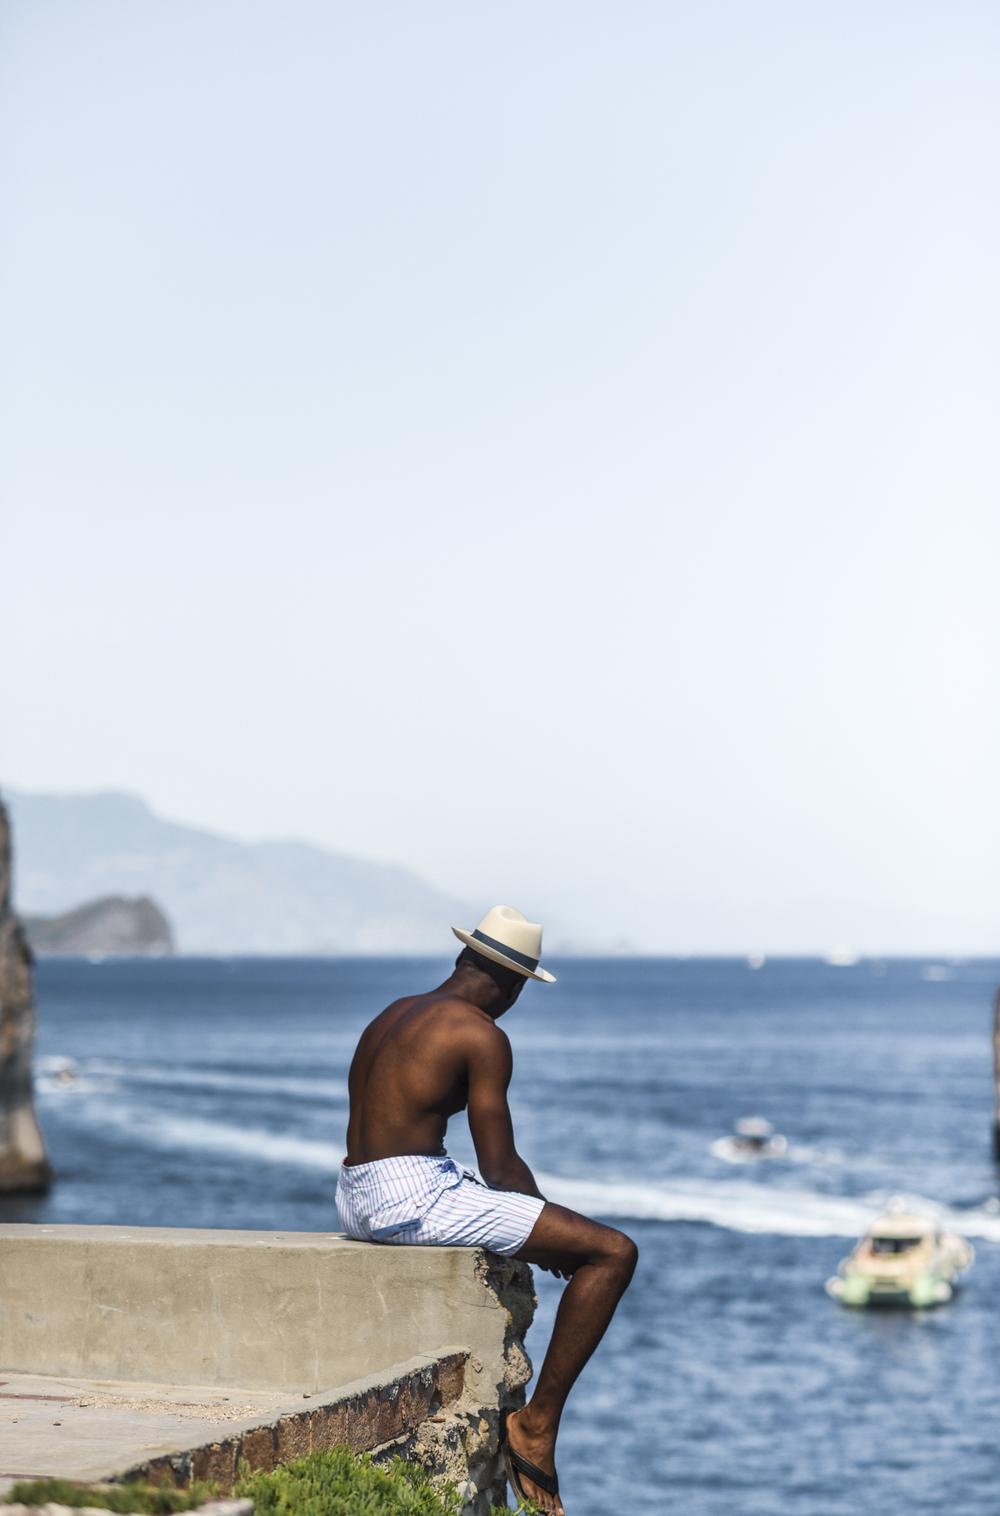 Veni-Vidi-Amavi-Dapper-Lou-Capri-Italy-Travel-Inspiration-2016-Blog-3-5.jpg